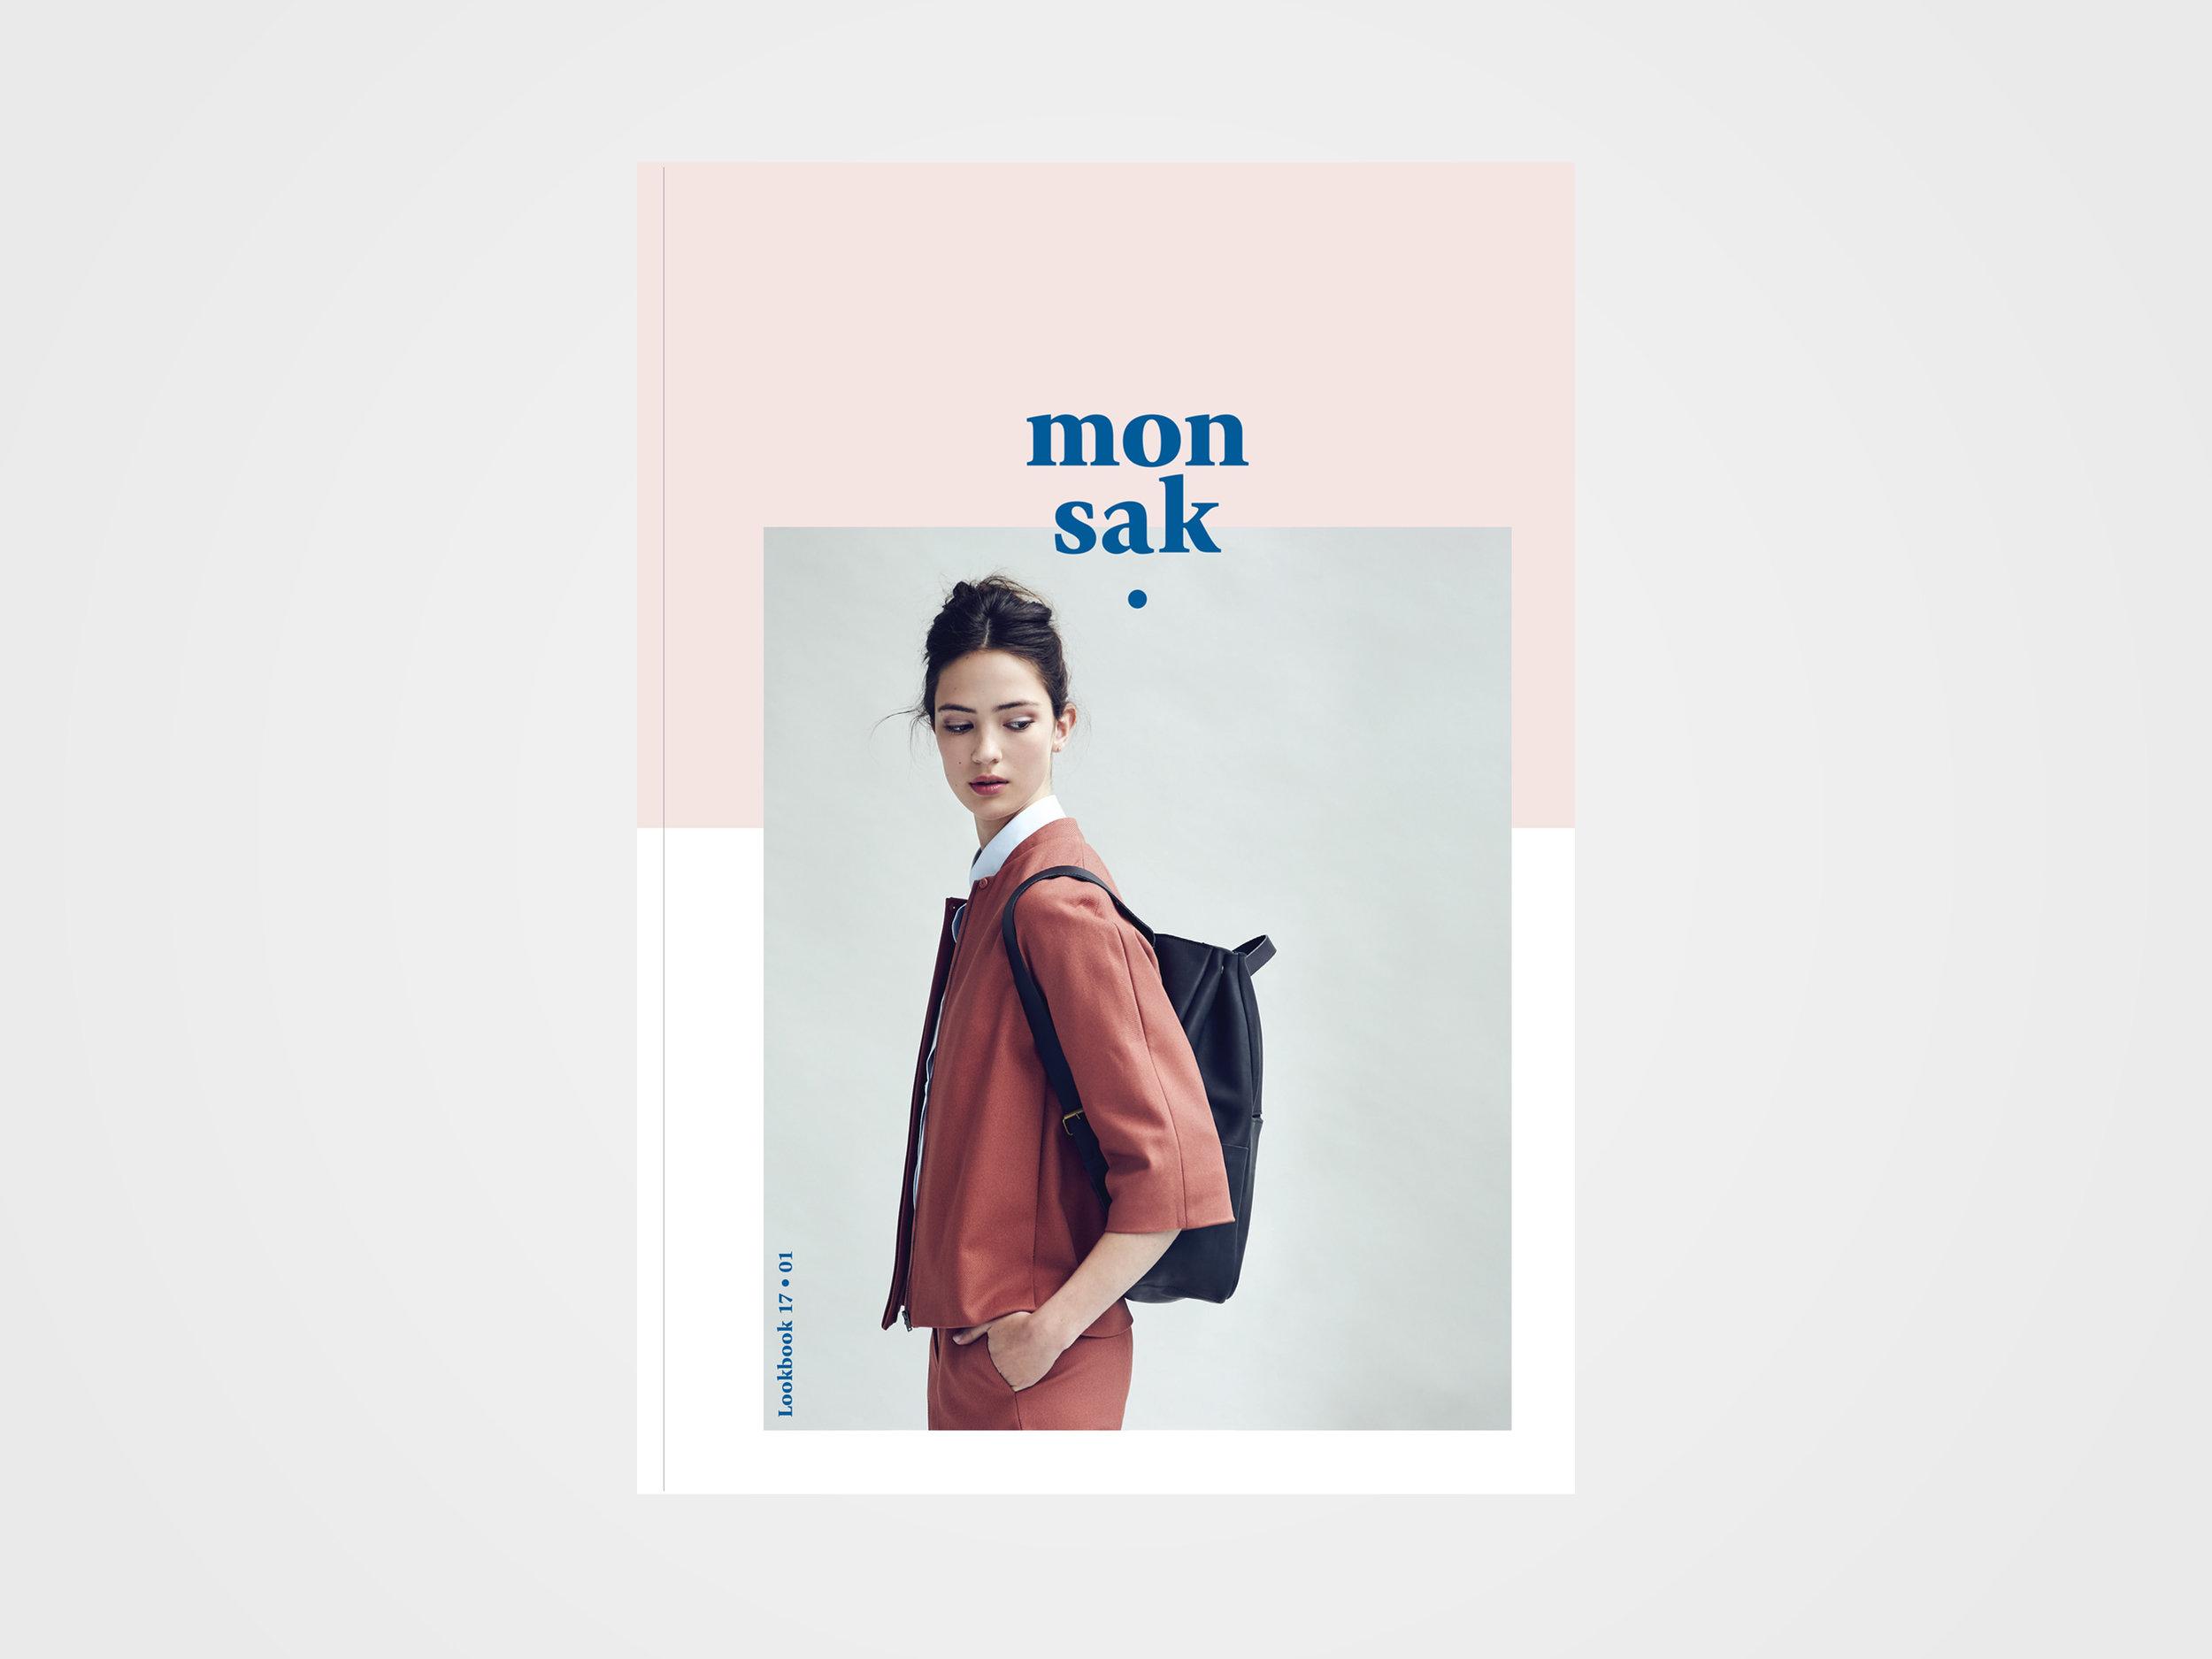 Monsak_lookbook comp1.jpg